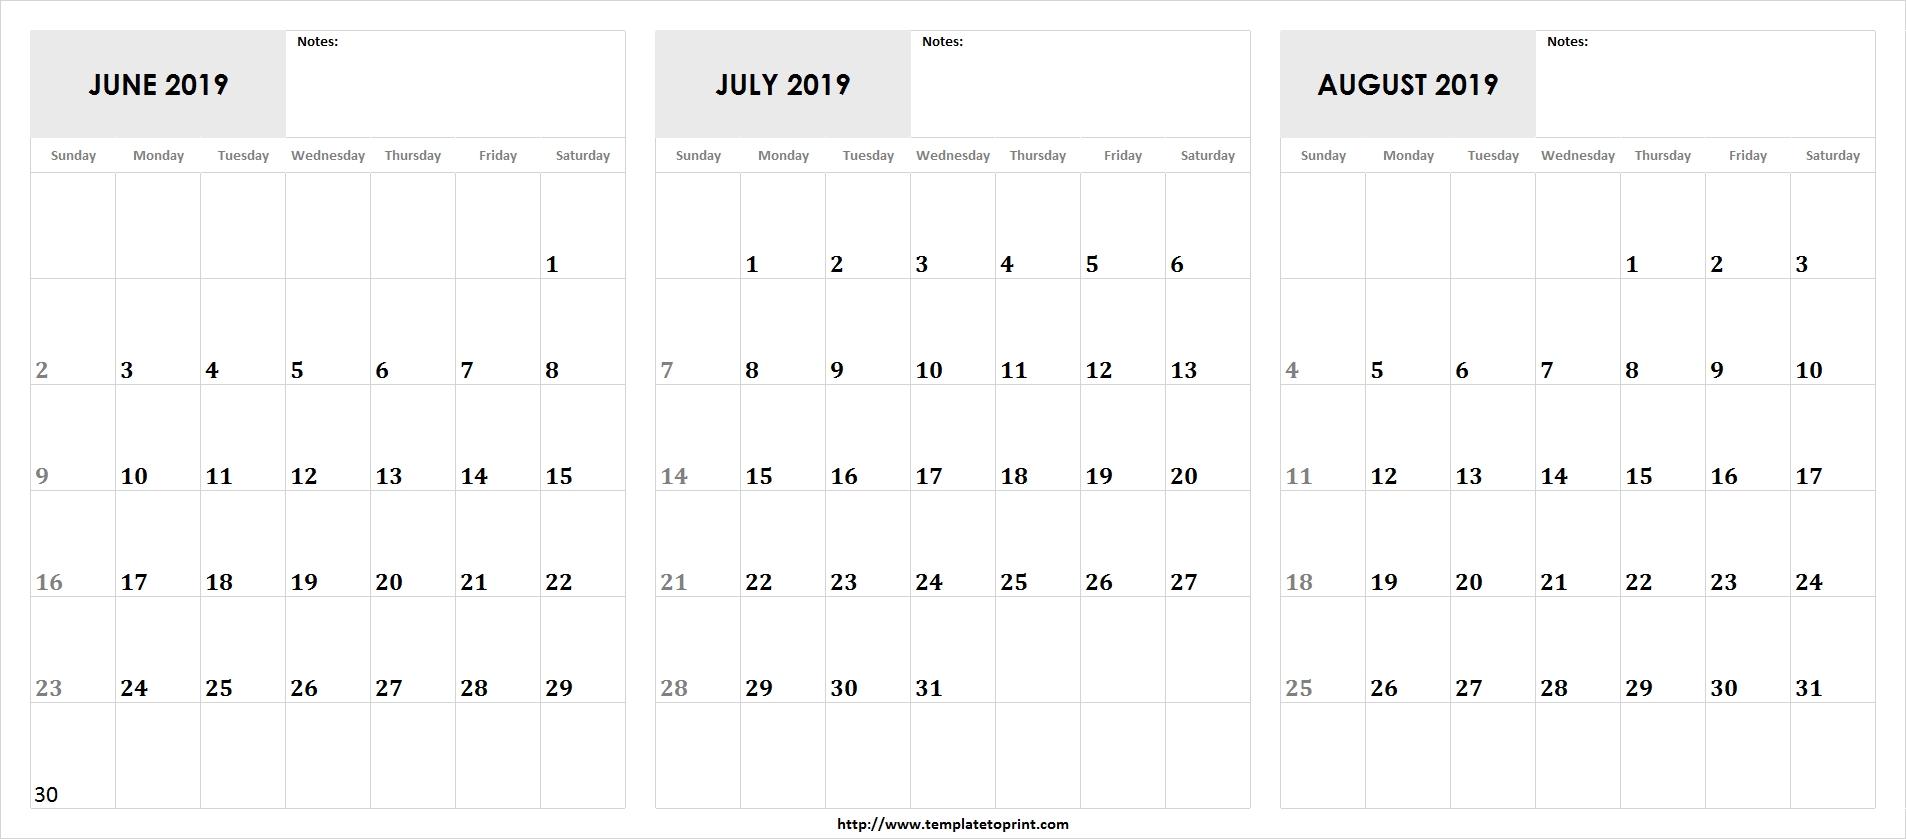 Blank Printable May June July 2019 Calendar » Template To Print Calendar 2019 June July August